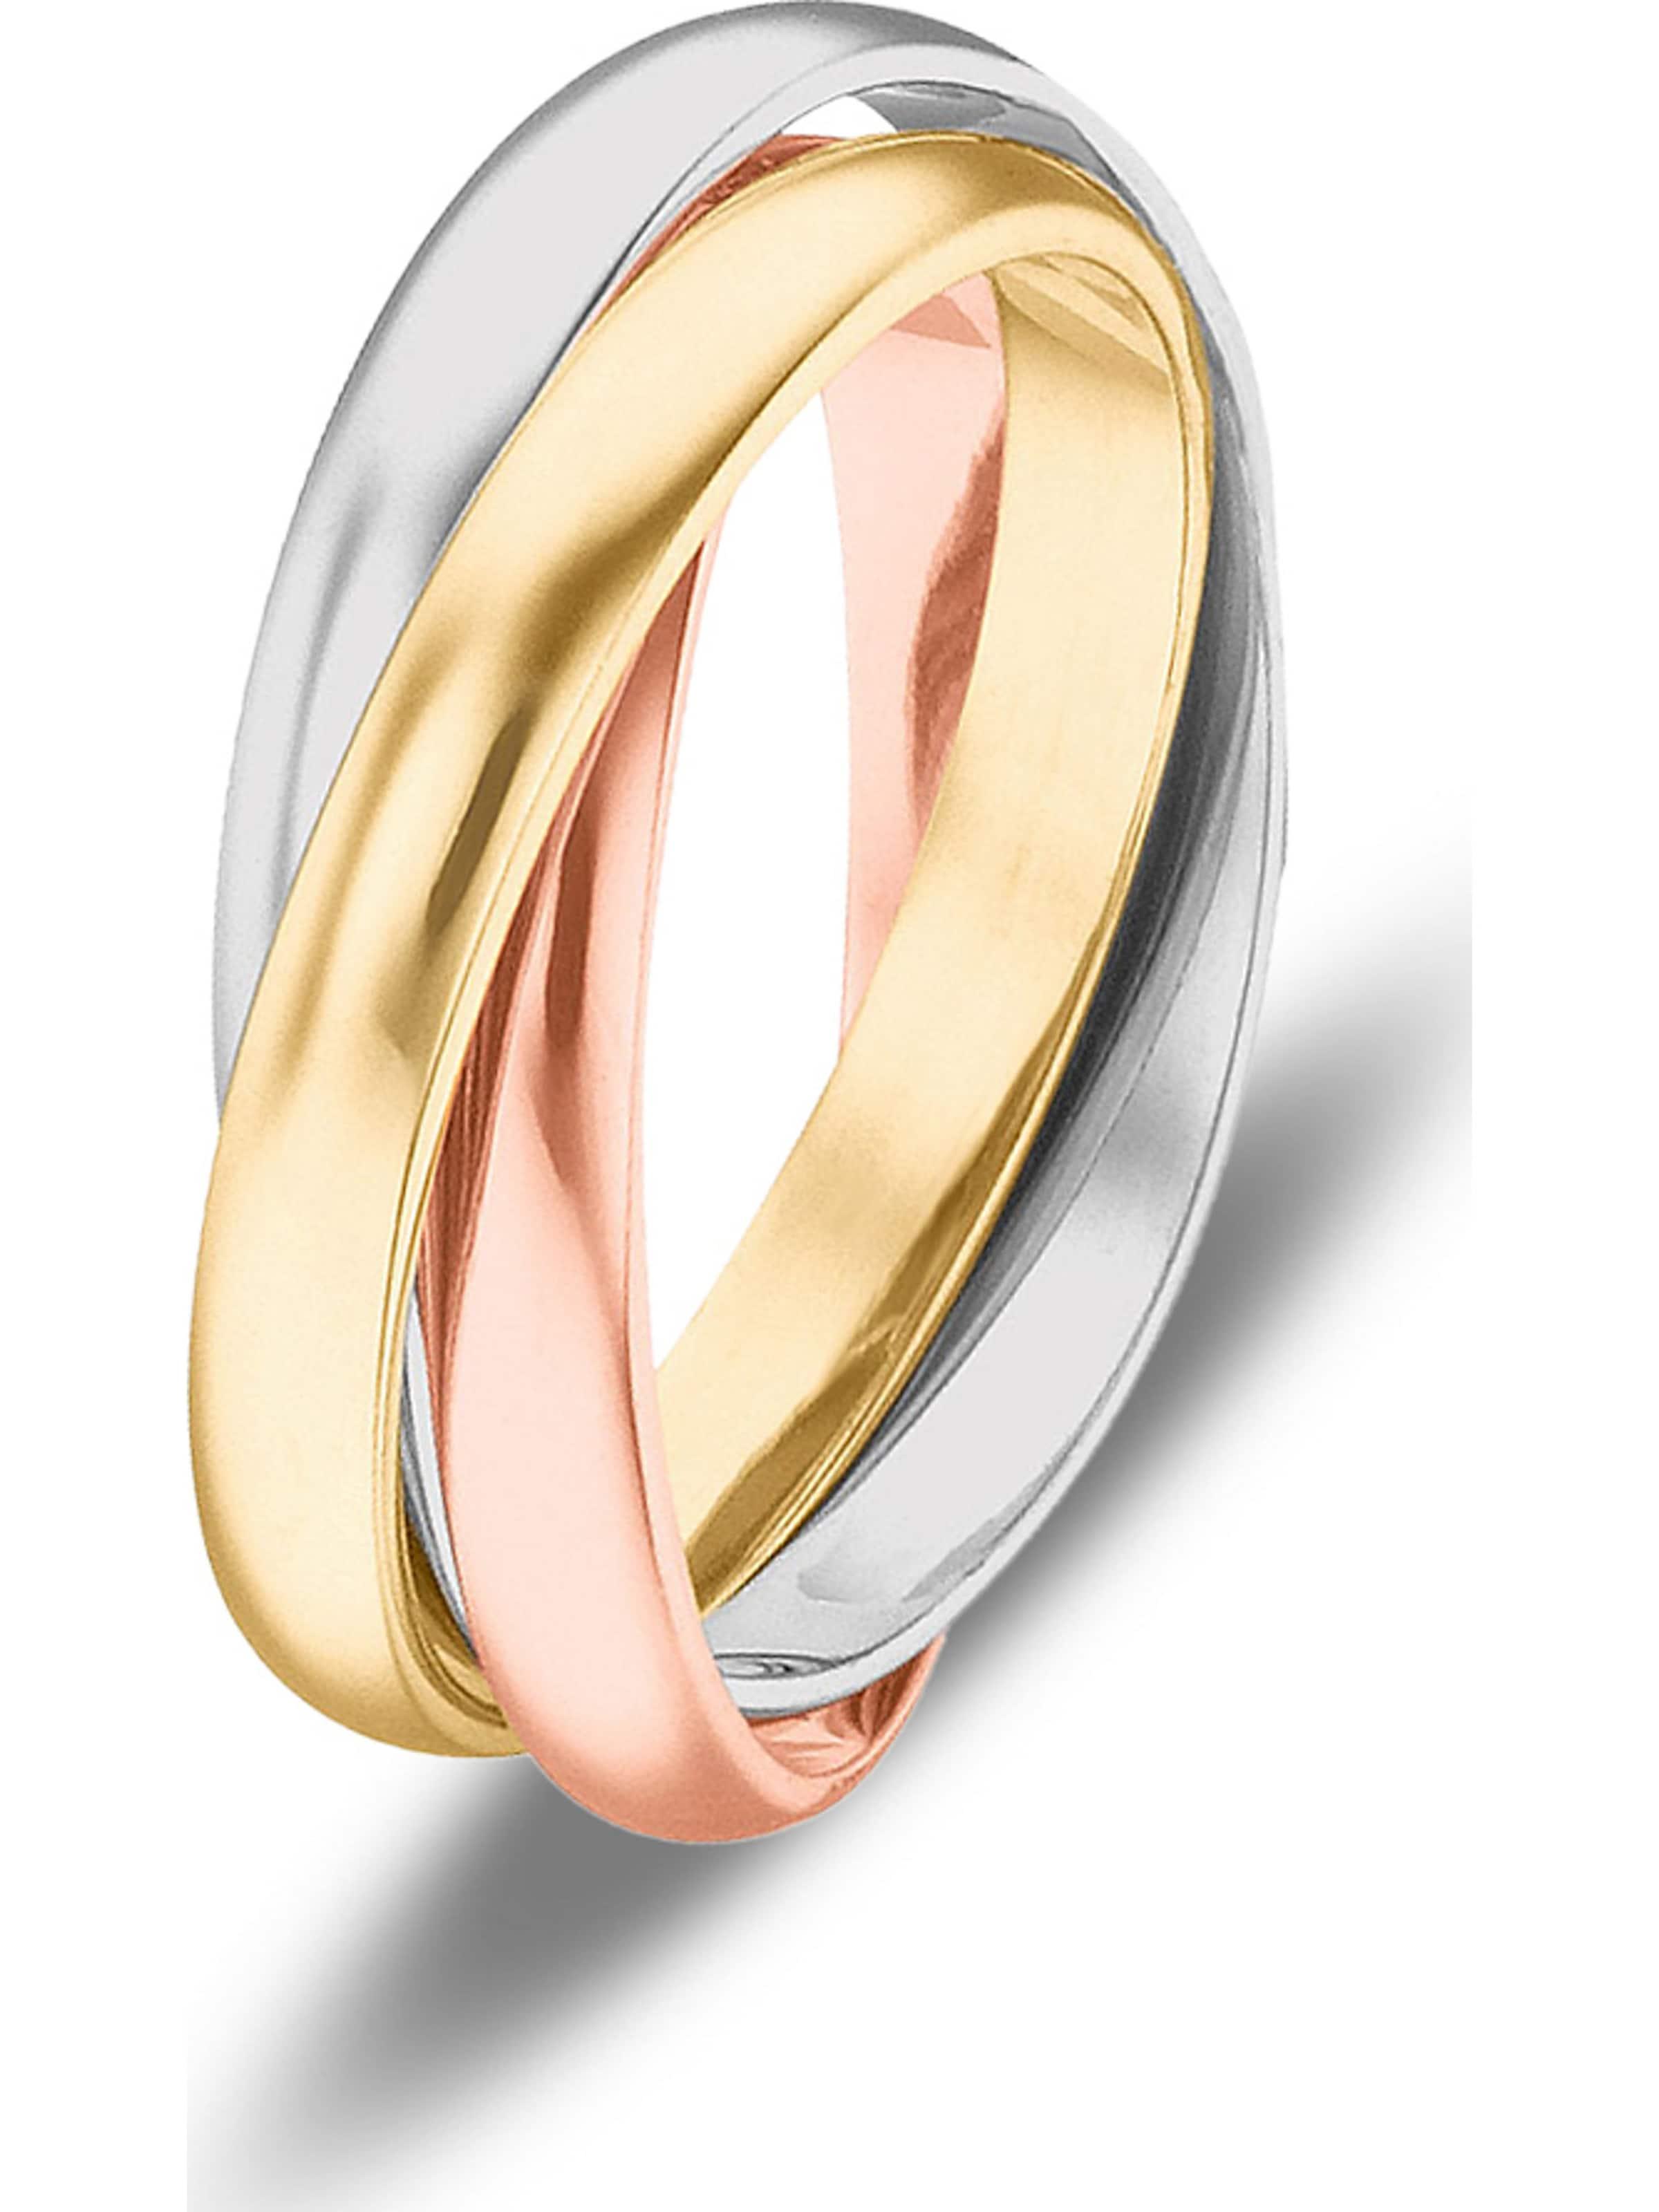 Ring In Silber GoldRosegold Christ Ring Ring Christ In Christ GoldRosegold Silber In m8n0Nw